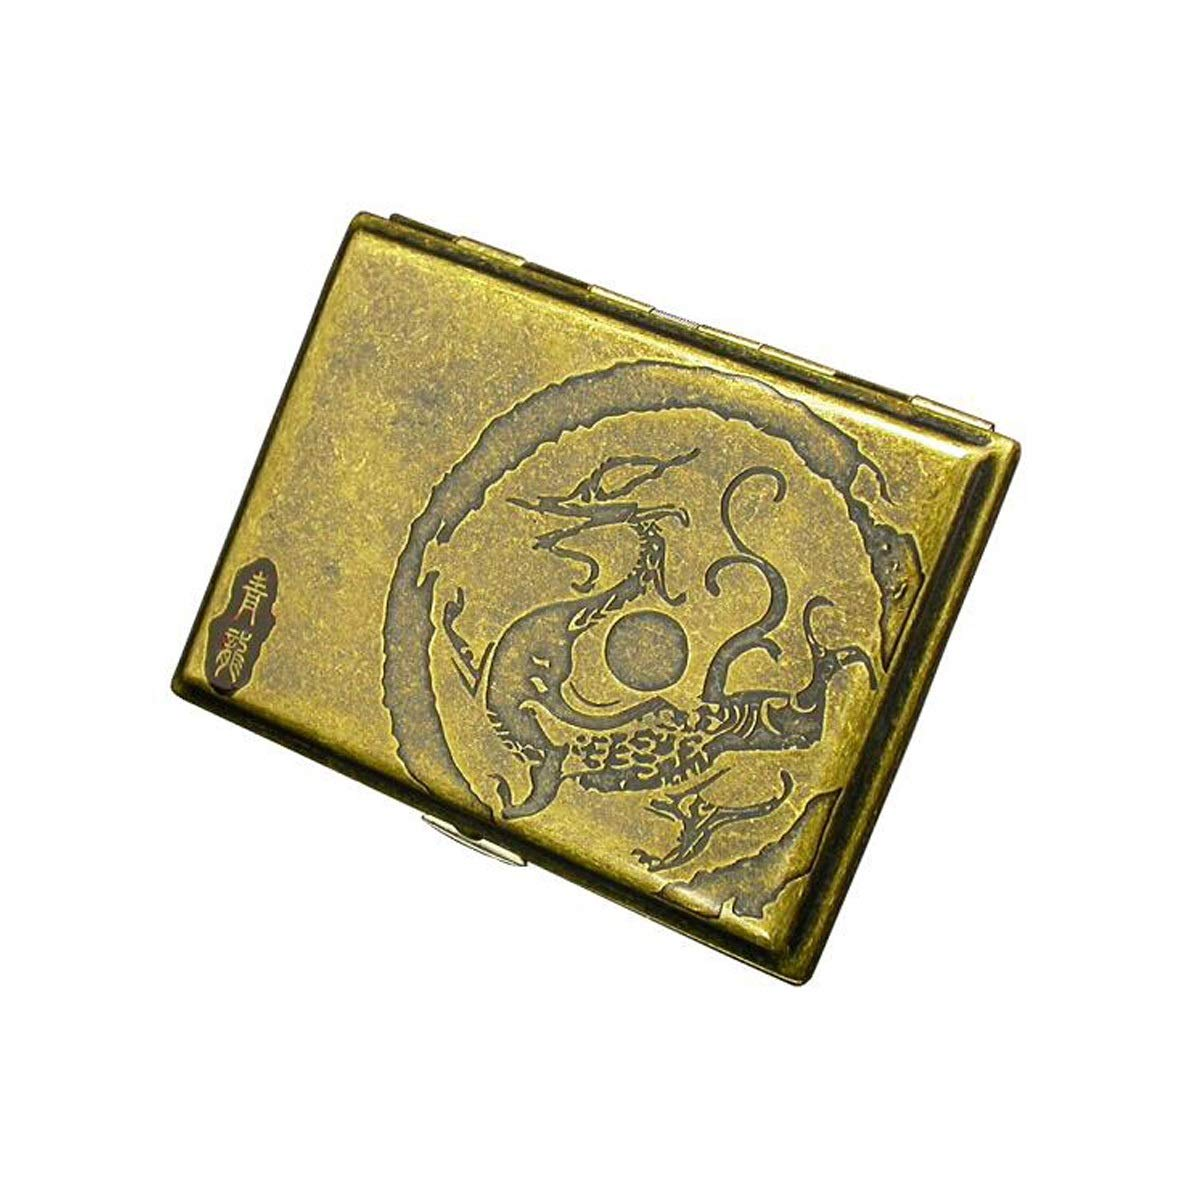 WENPINHUI Cigarette Case, Copper Cigarette Case, 16 Cigarette Holders, Ancient God Beast, Suzaku, Qinglong White Tiger, Basaltic Cigarette Box (Color : C) by WENPINHUI